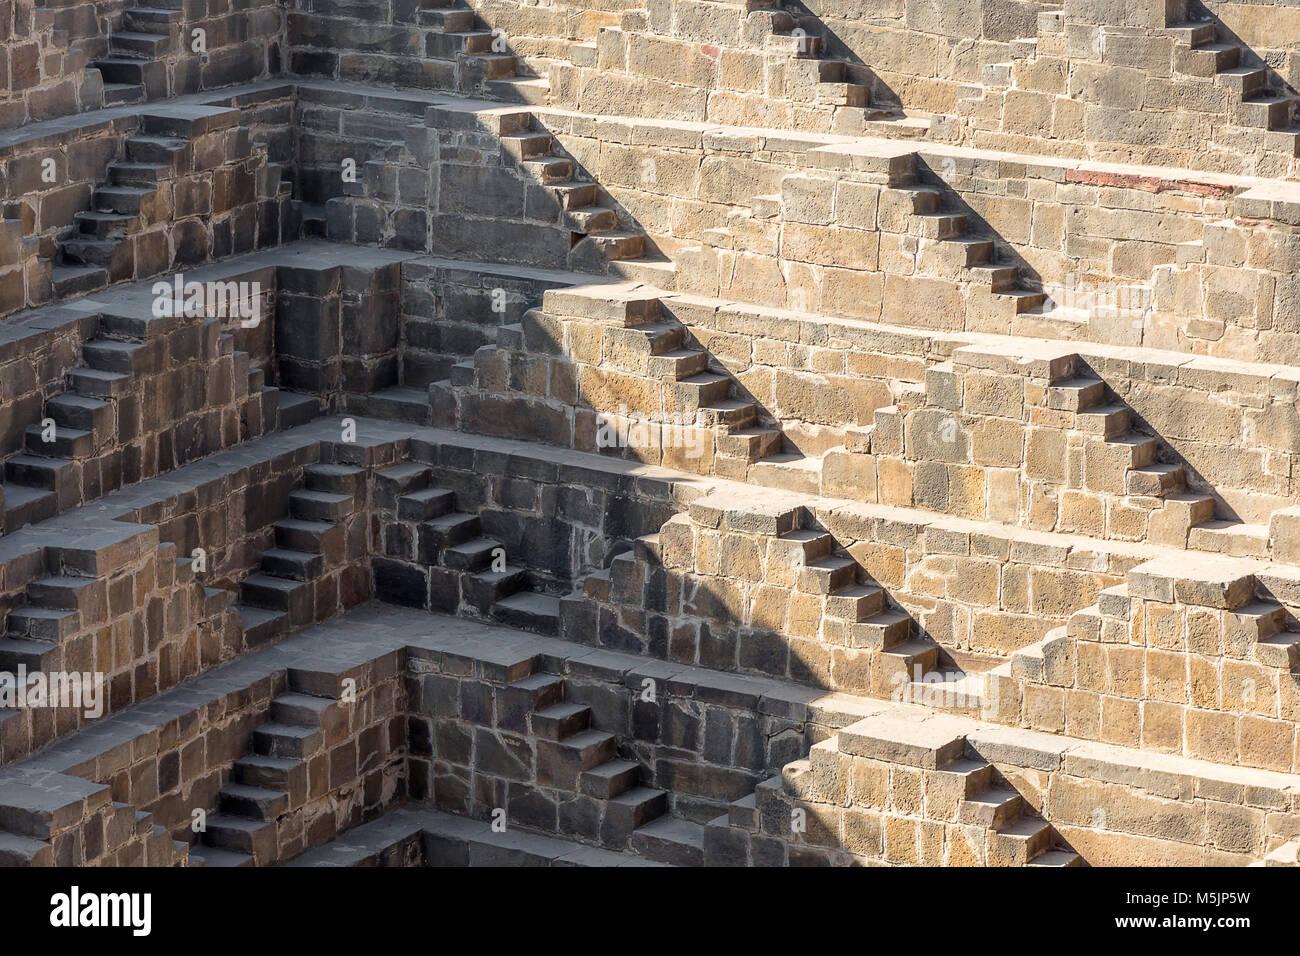 Water Tank Stairs : Water tank stairs stock photos